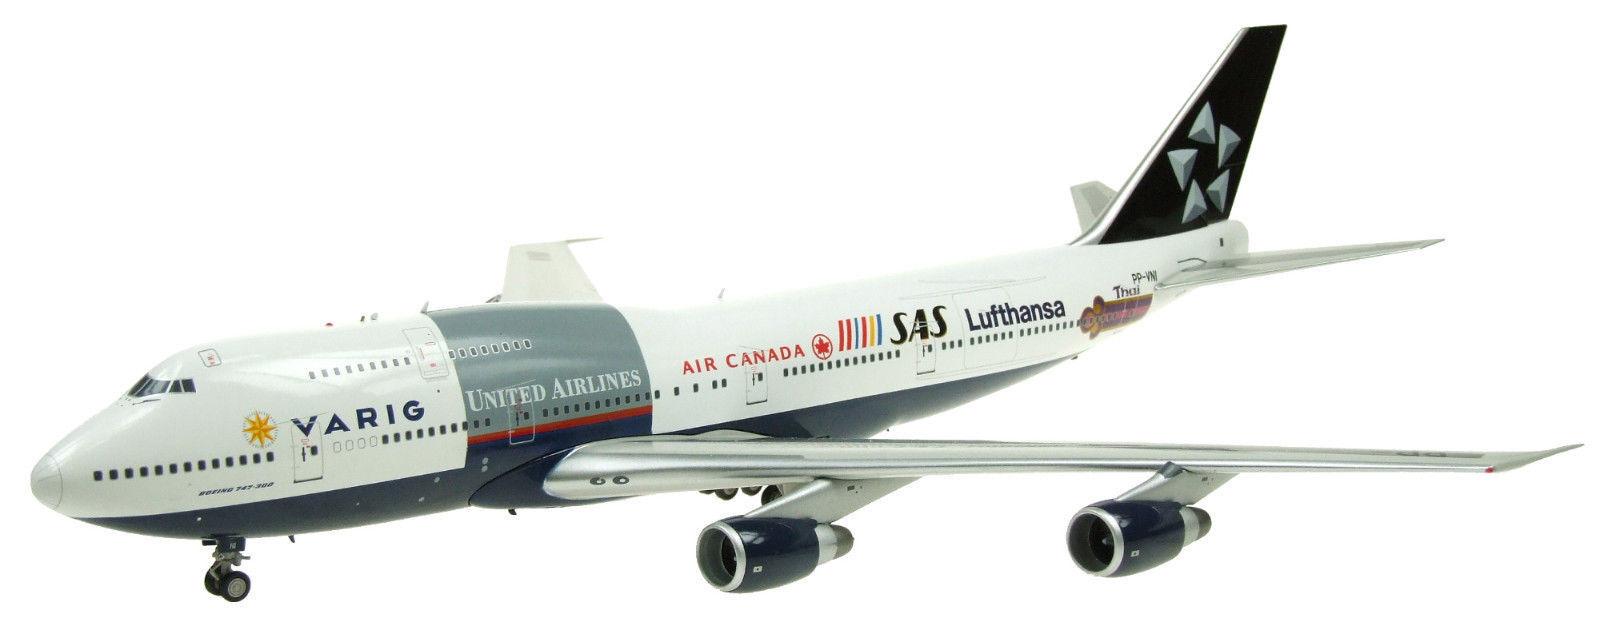 Inflight 200 IF7431216 1 200 Varig Star Alliance Boeing 747-300 PP-VNI Inc Soporte